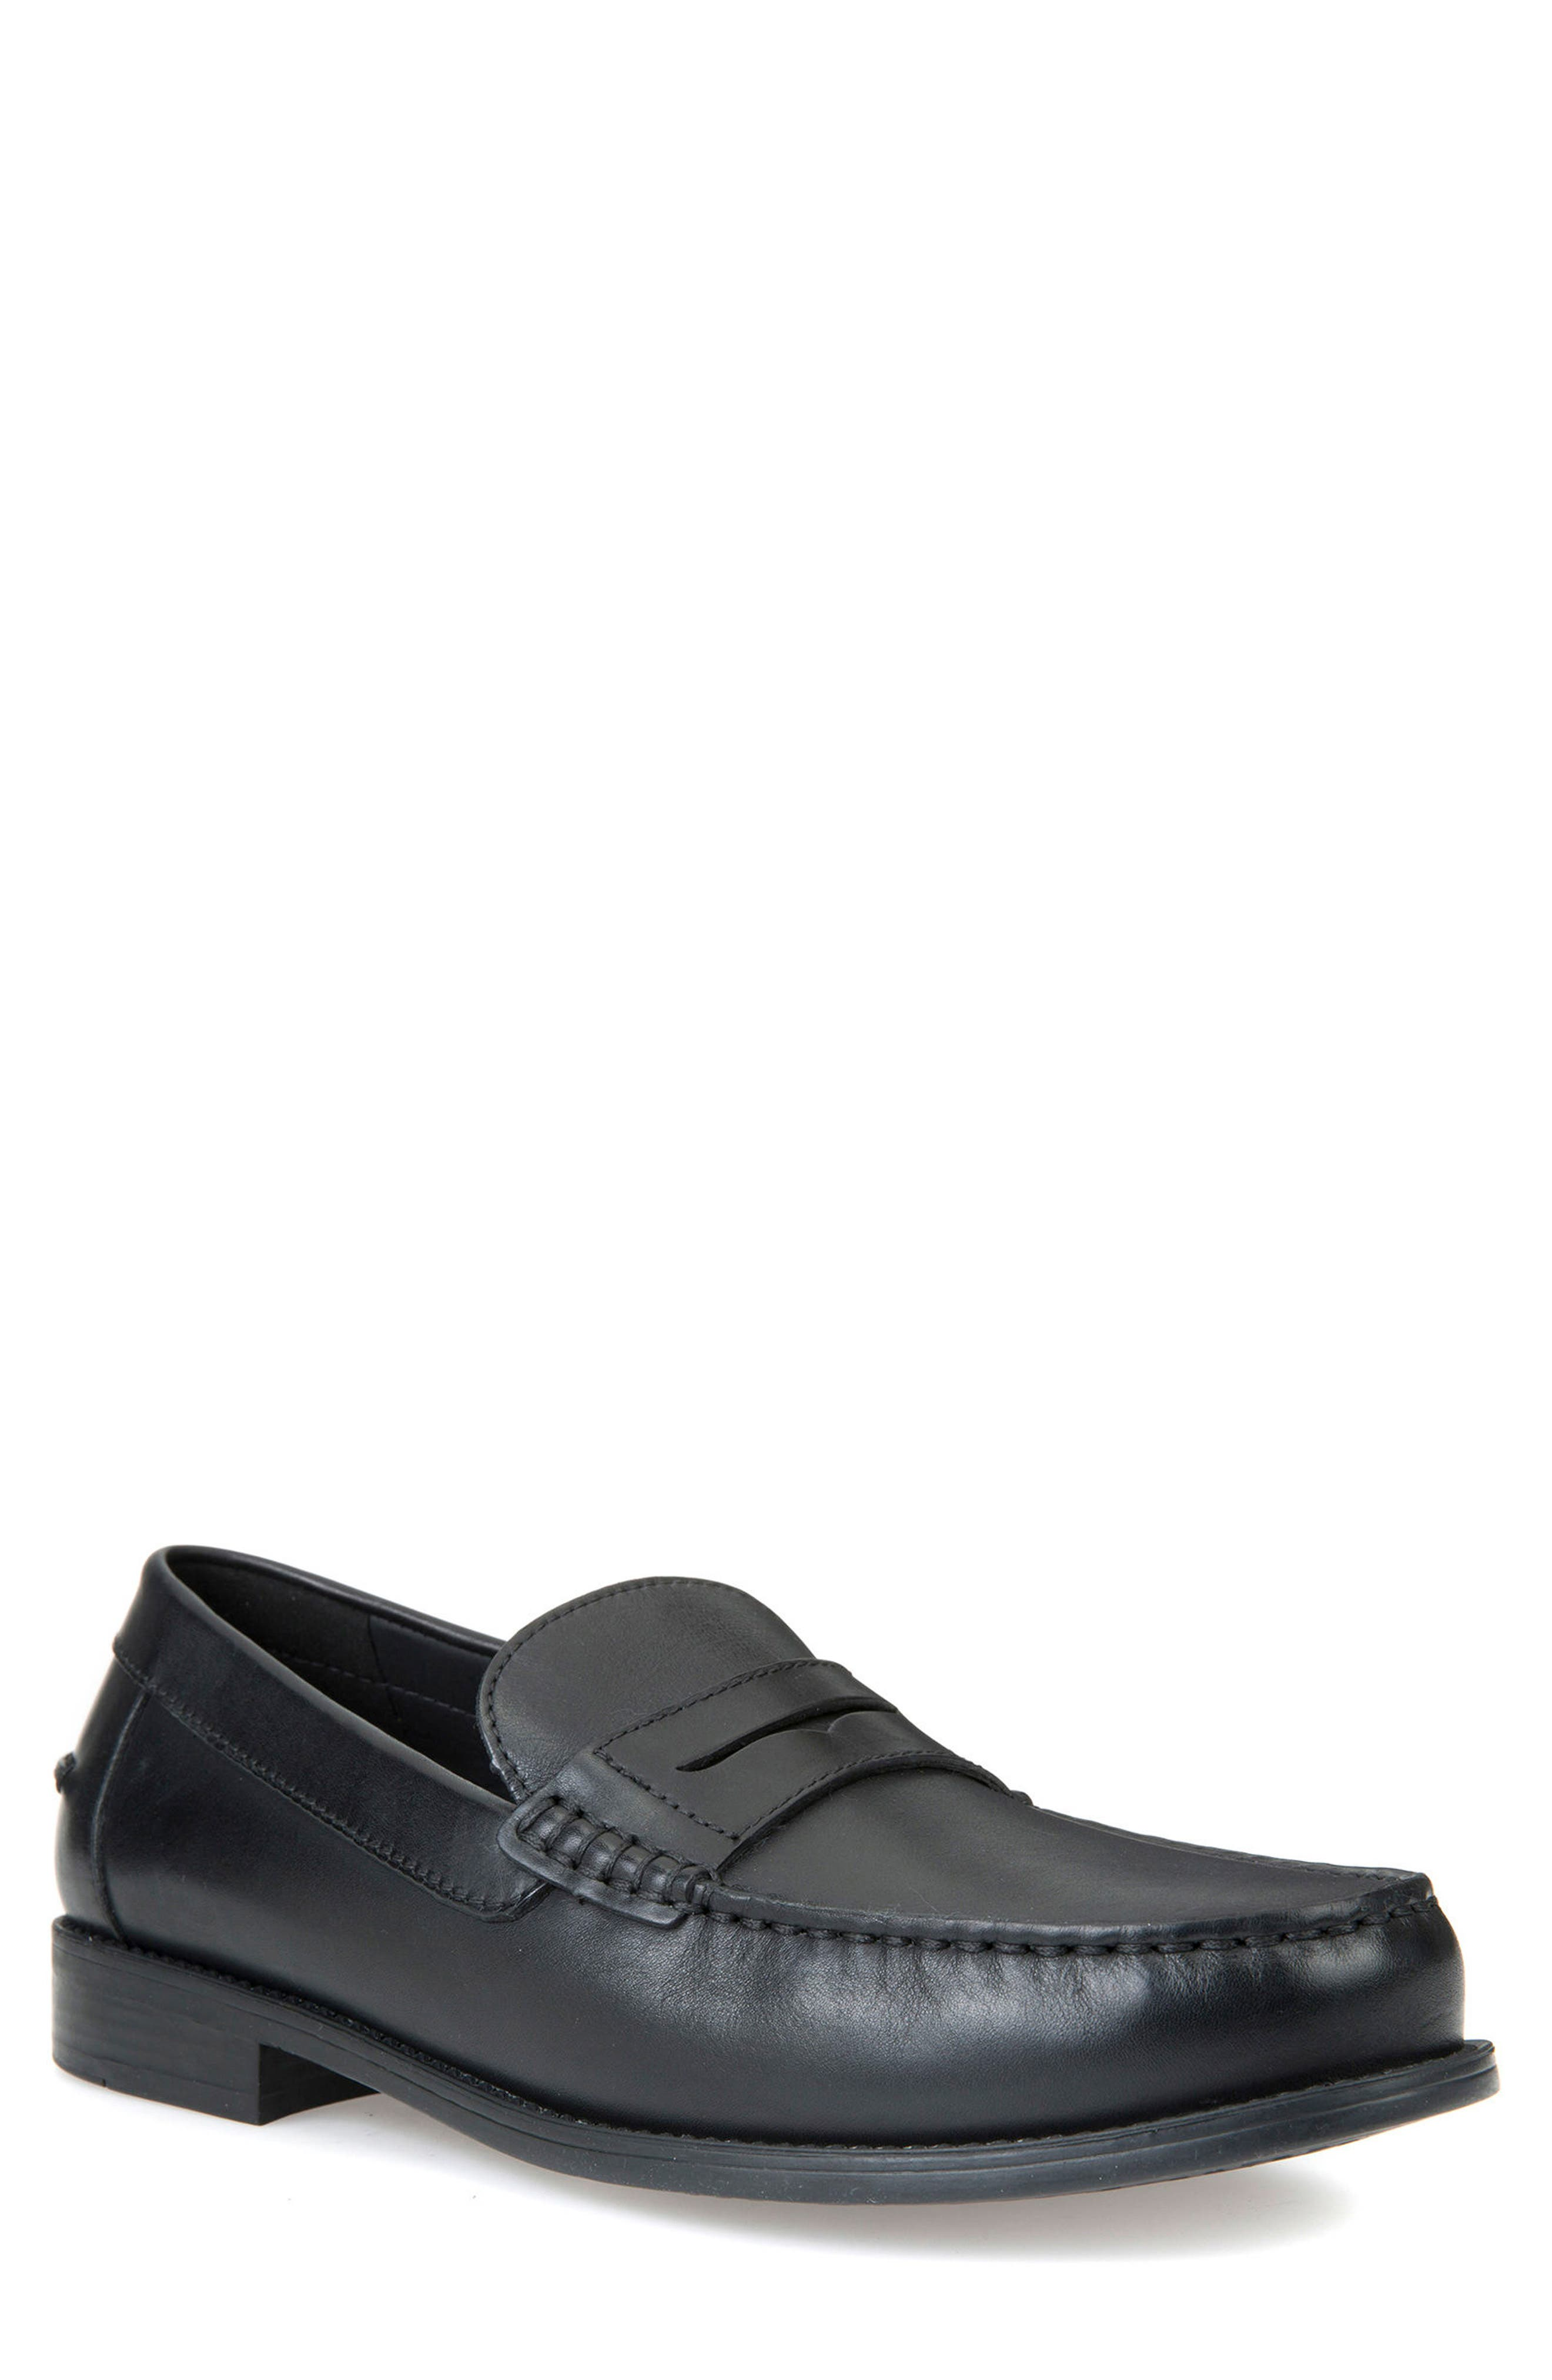 New Damon 1 Slip-On Penny Loafer,                         Main,                         color, BLACK LEATHER